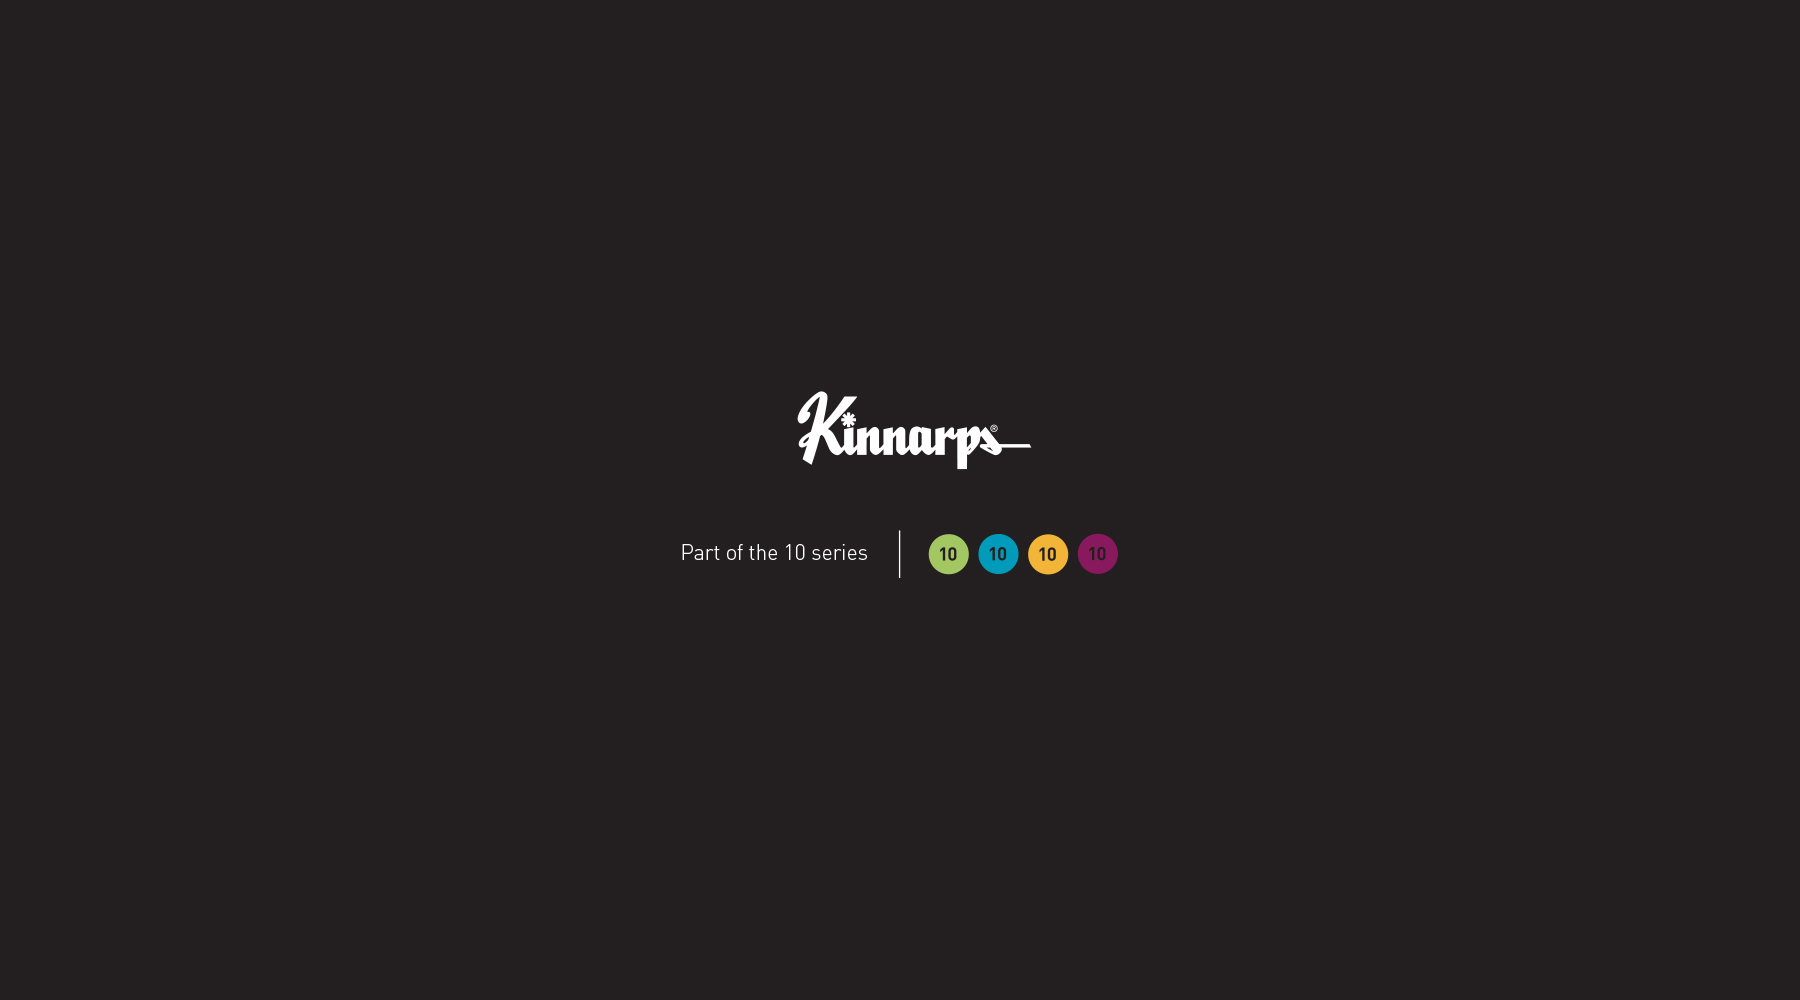 Kinnarps_10_header